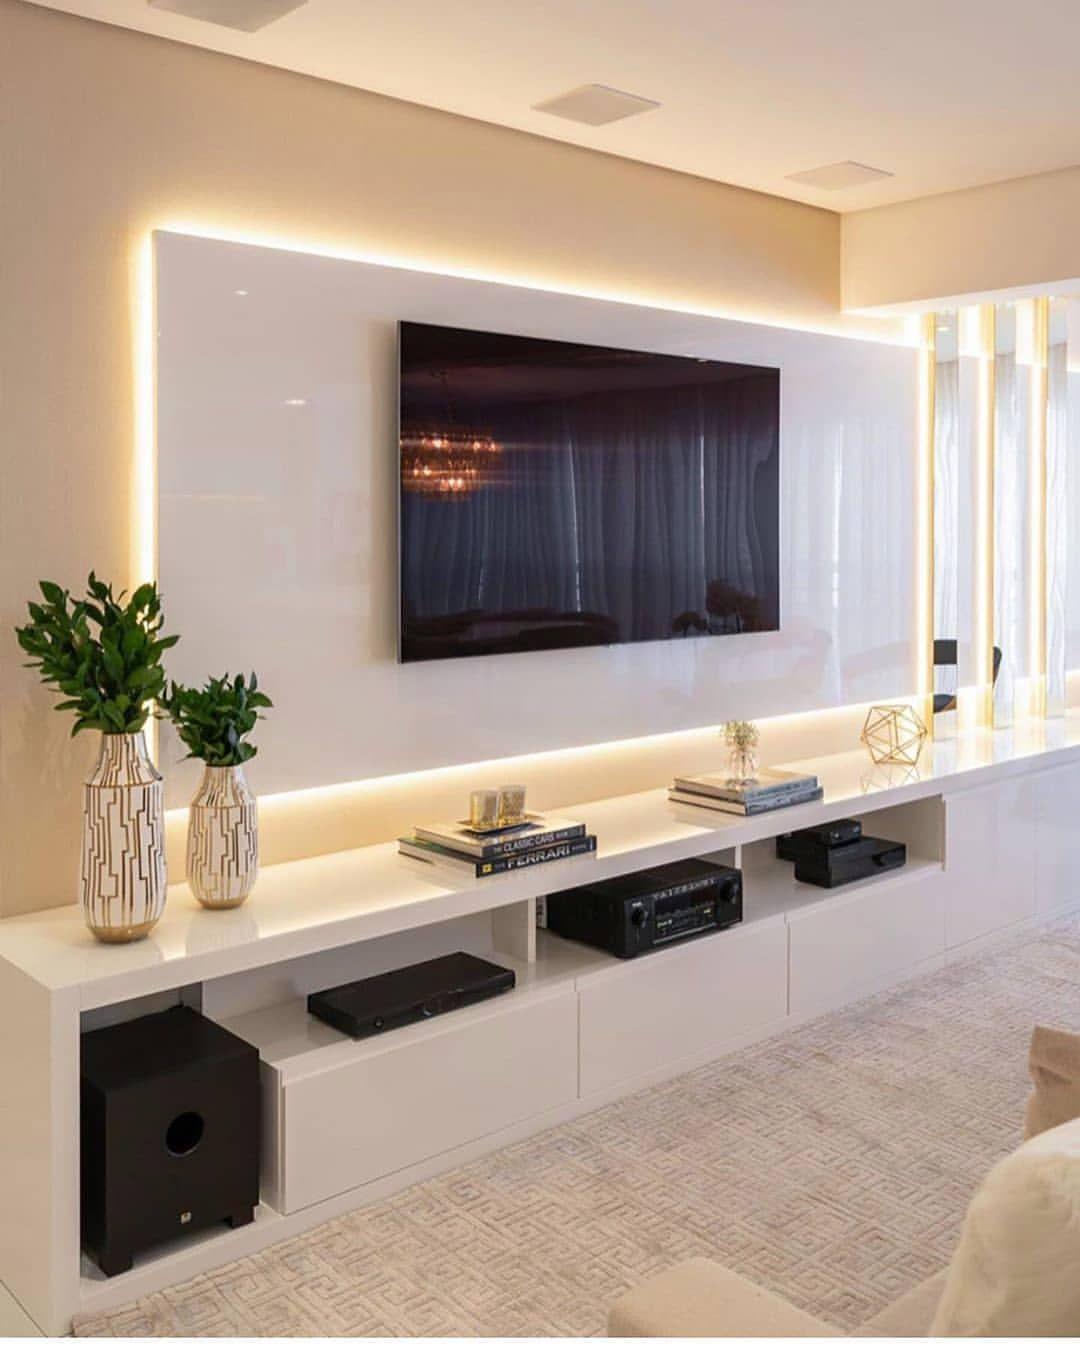 ديكور تلفاز ديكورات تلفزيون in 2020 tv room design on incredible tv wall design ideas for living room decor layouts of tv models id=24000